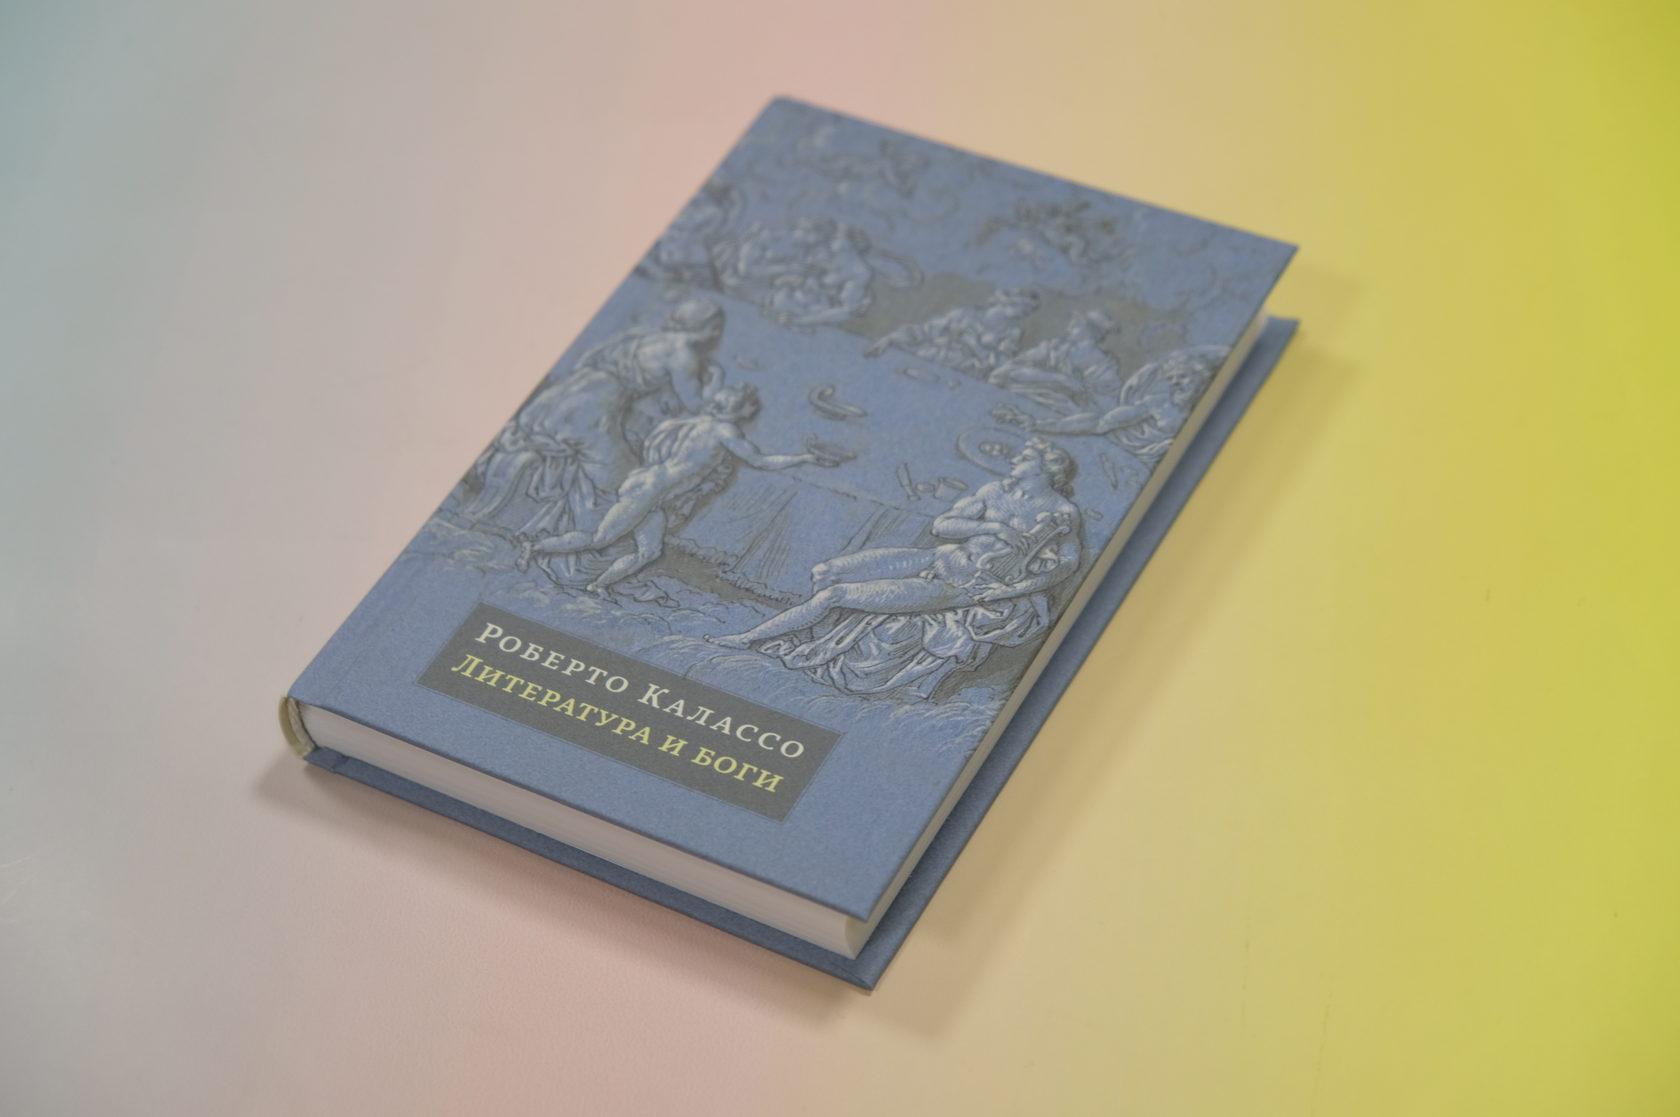 Роберто Калассо «Литература и боги», 978-5-89059346-7